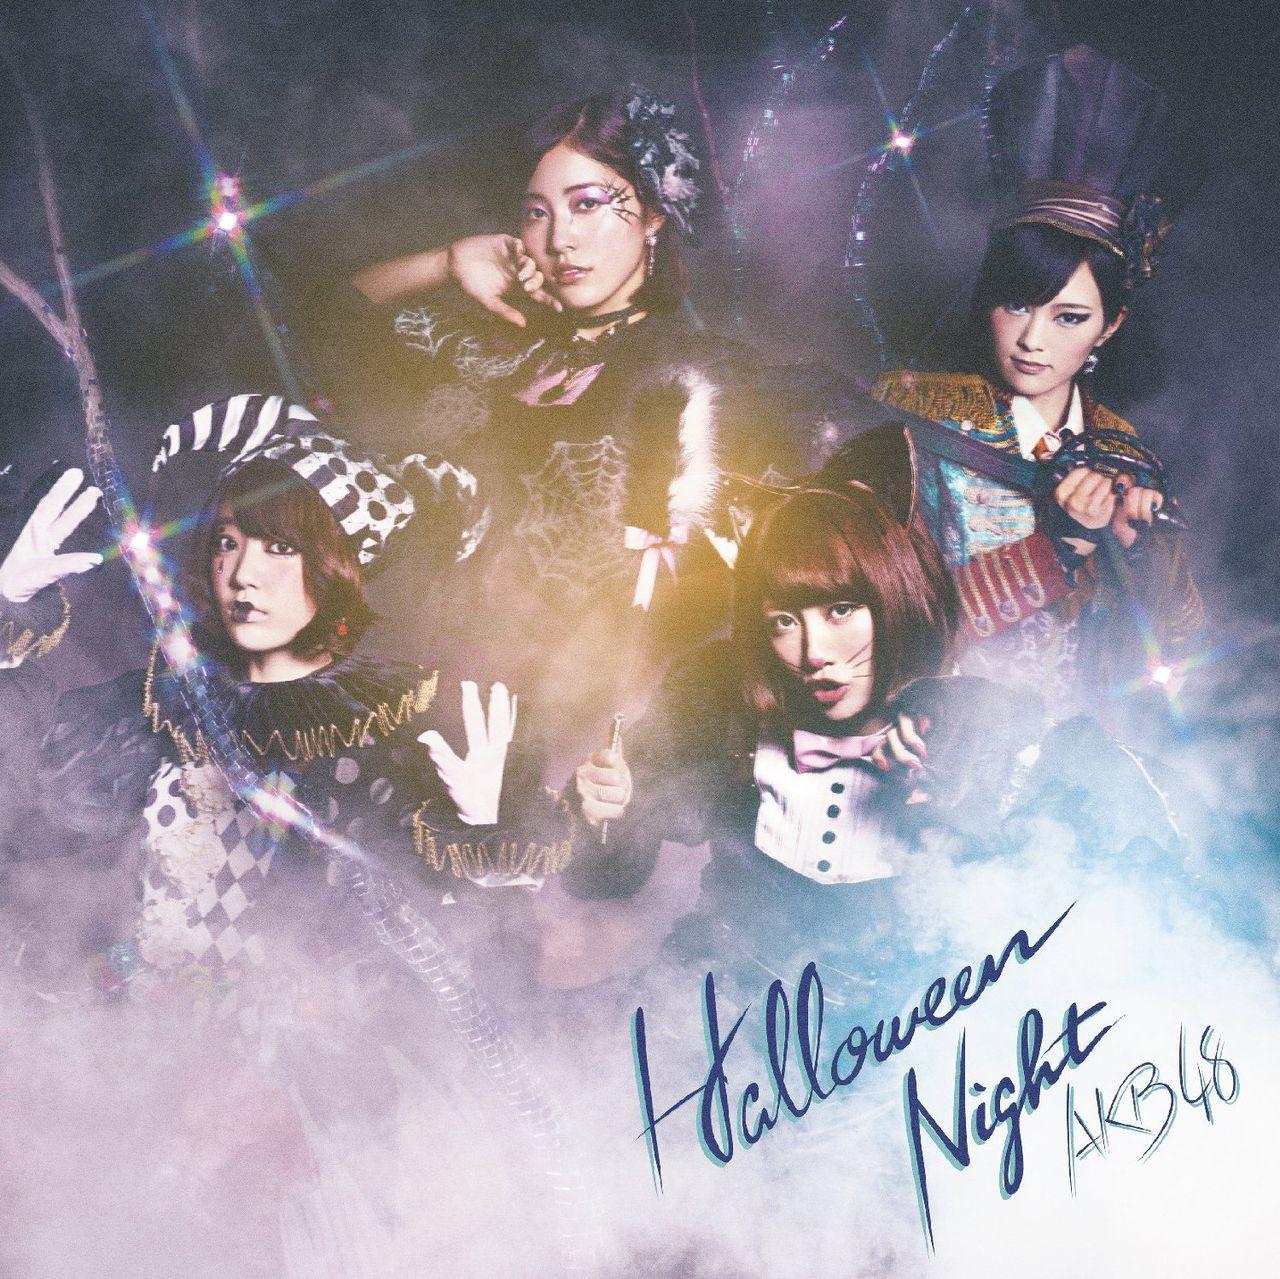 20161118.01.12 AKB48 - Halloween Night (Types A) cover 6.jpg